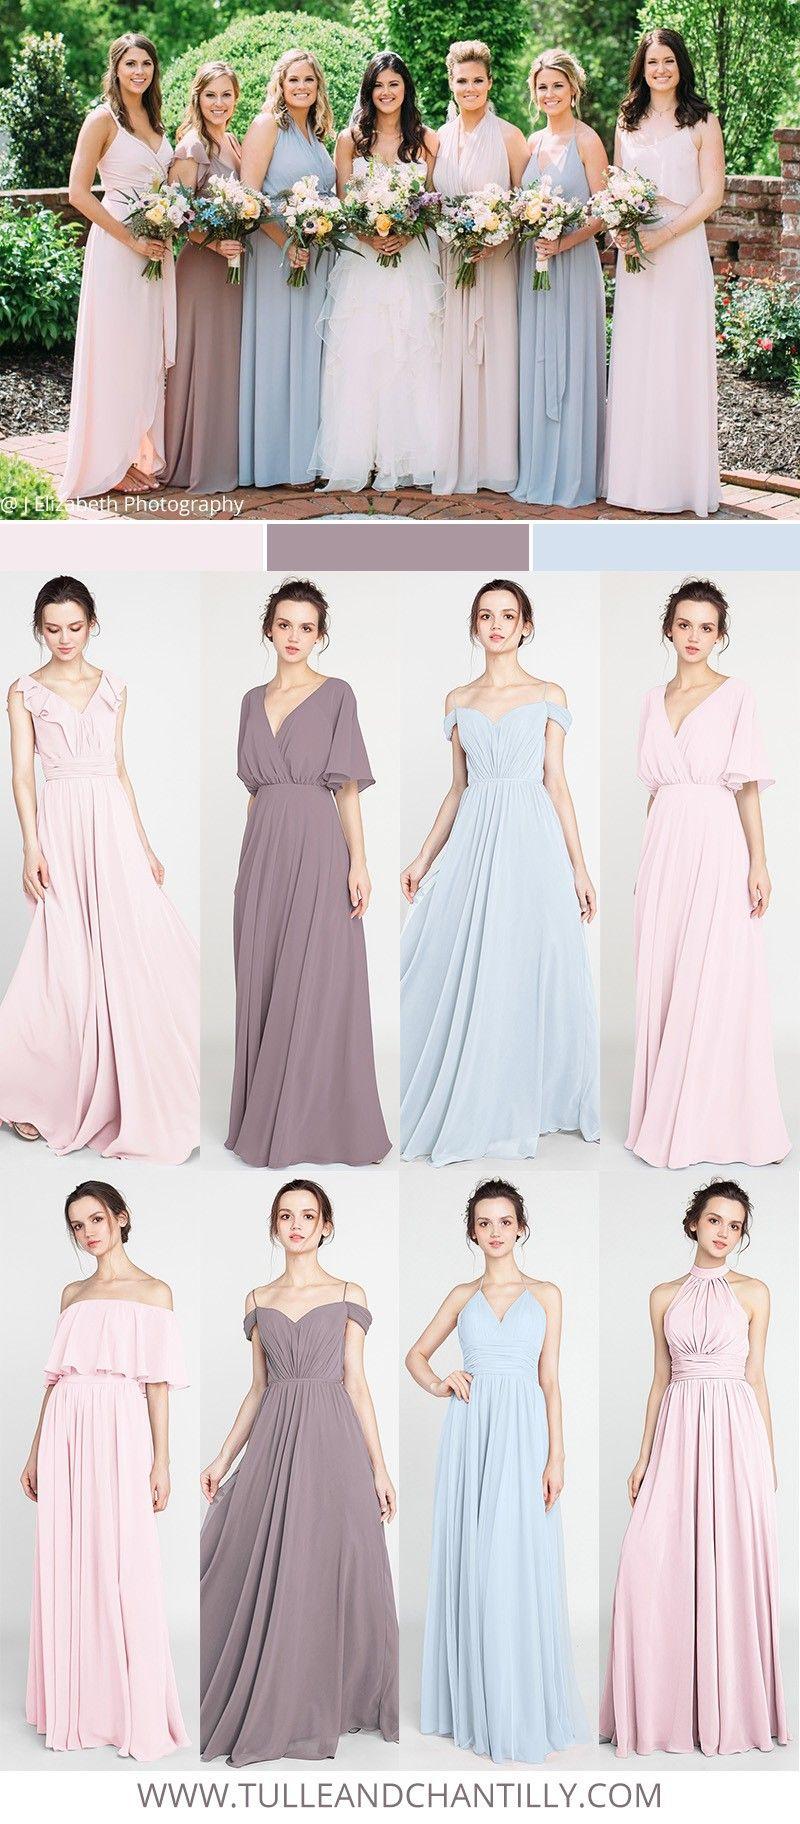 Mismatched Bridesmaid Dresses For 2018 Trends 2 Bridesmaiddress Bridalparty Weddingcolor Bridesmaid Dresses Mismatched Bridesmaid Dresses City Wedding Dress